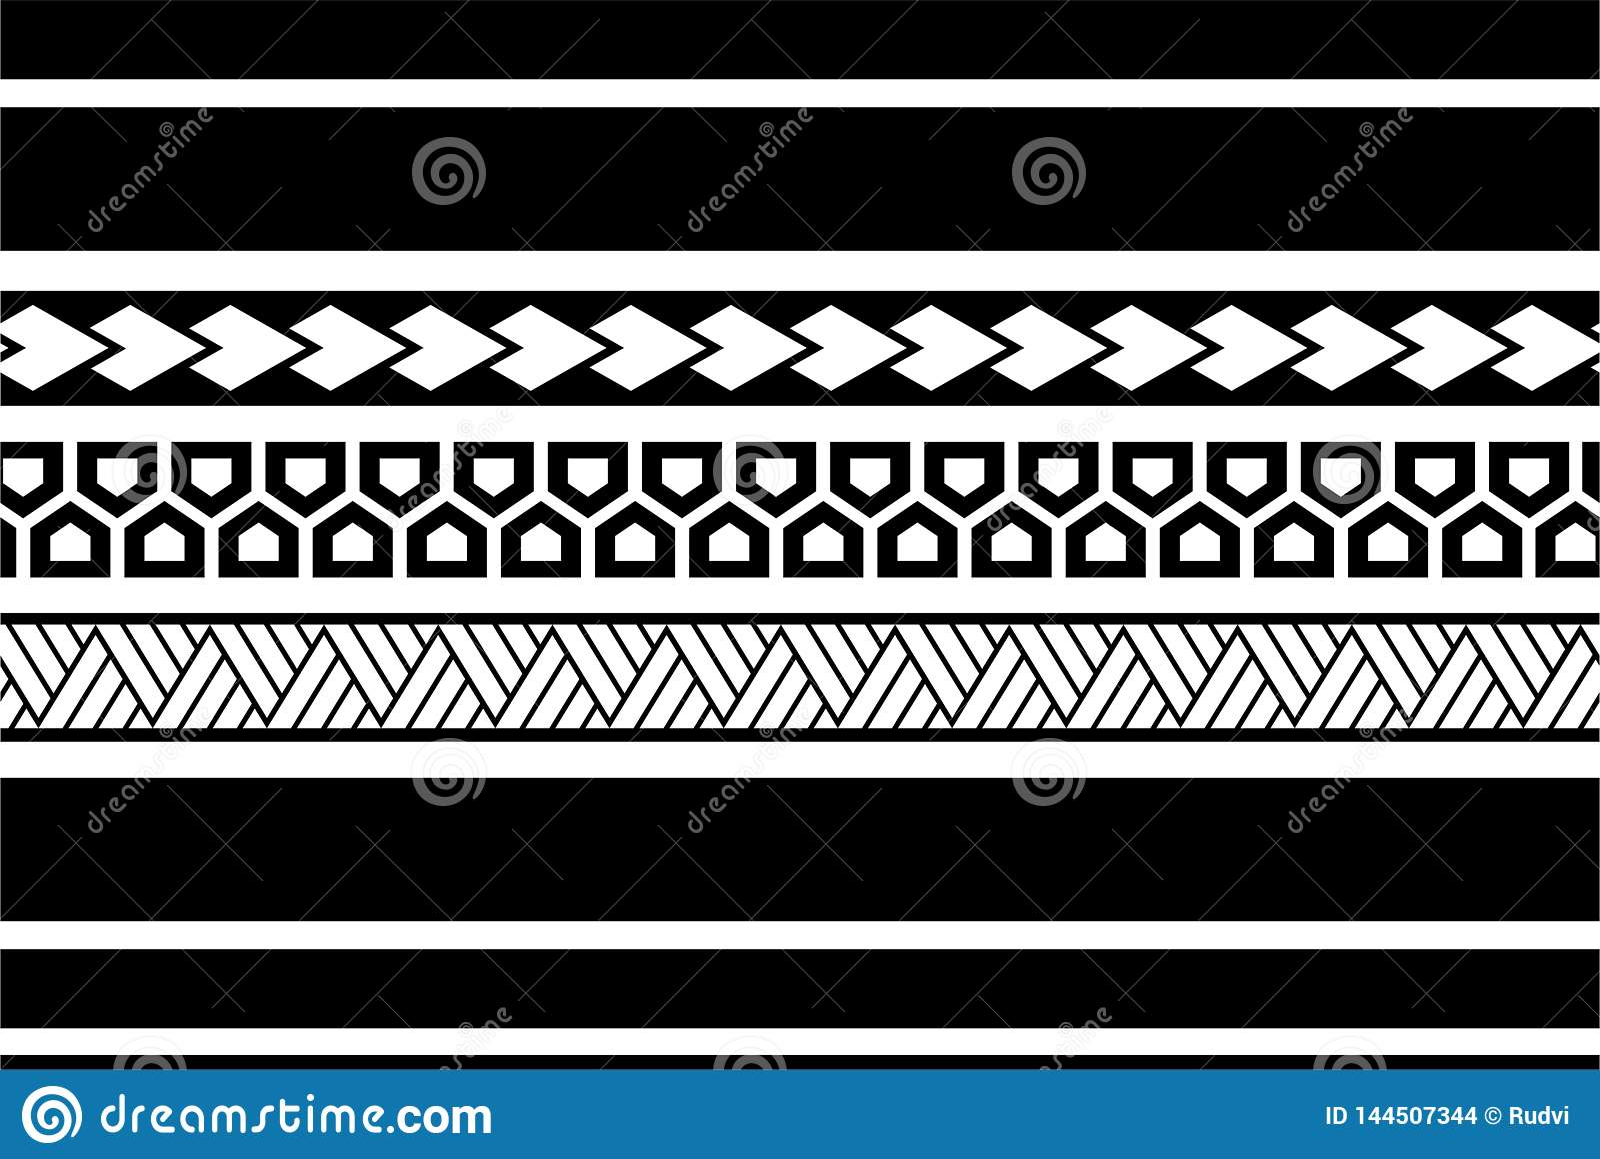 foto de Polynesian Tattoo Sleeve Pattern Vector, Samoan Sketch Forearm And ...